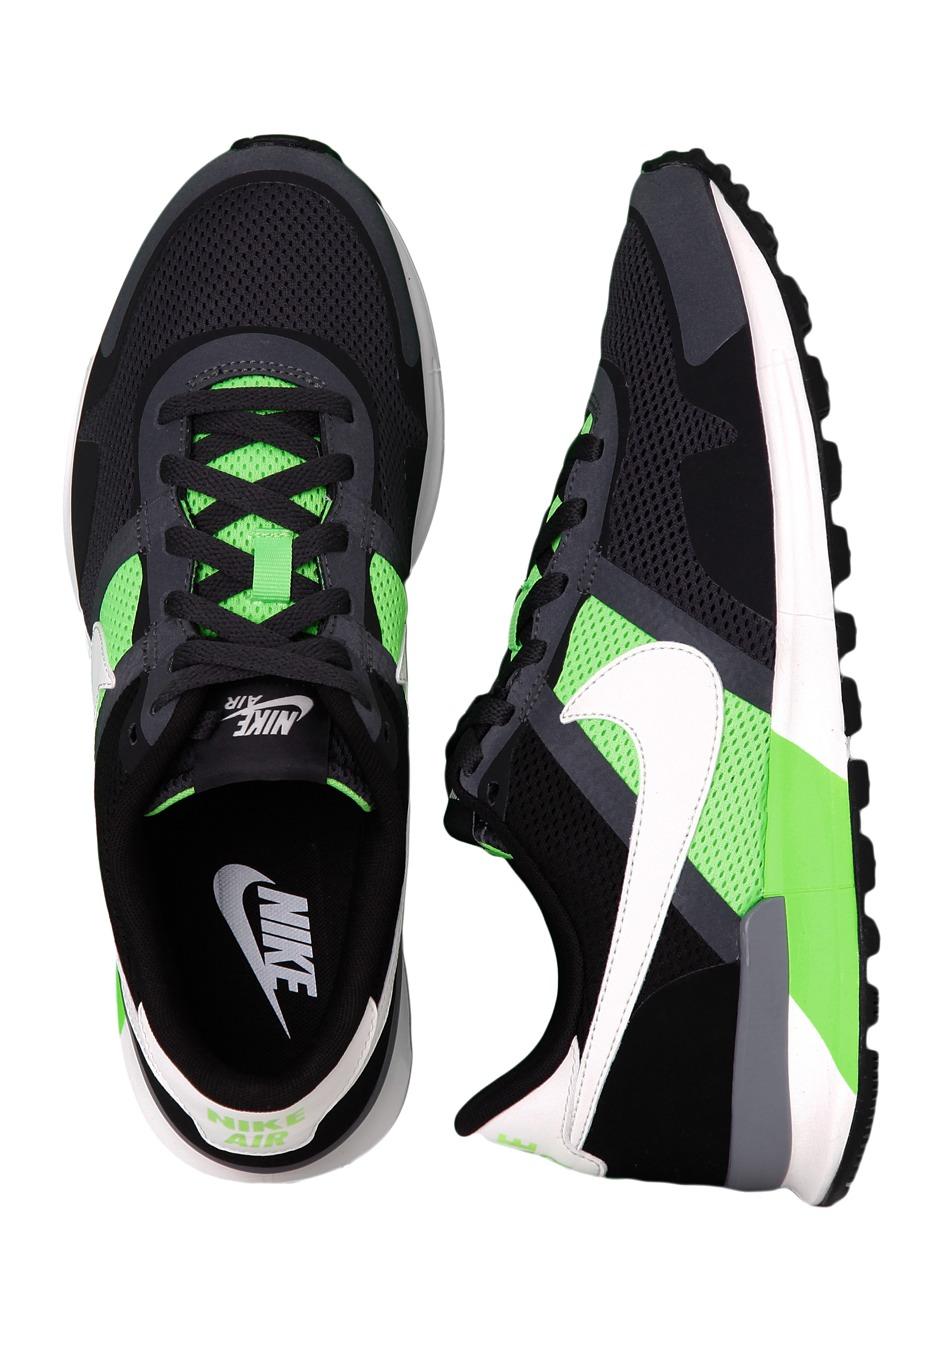 Nike - Air Pegasus 83/30 Anthracite/Sail Flash/Lime - Shoes